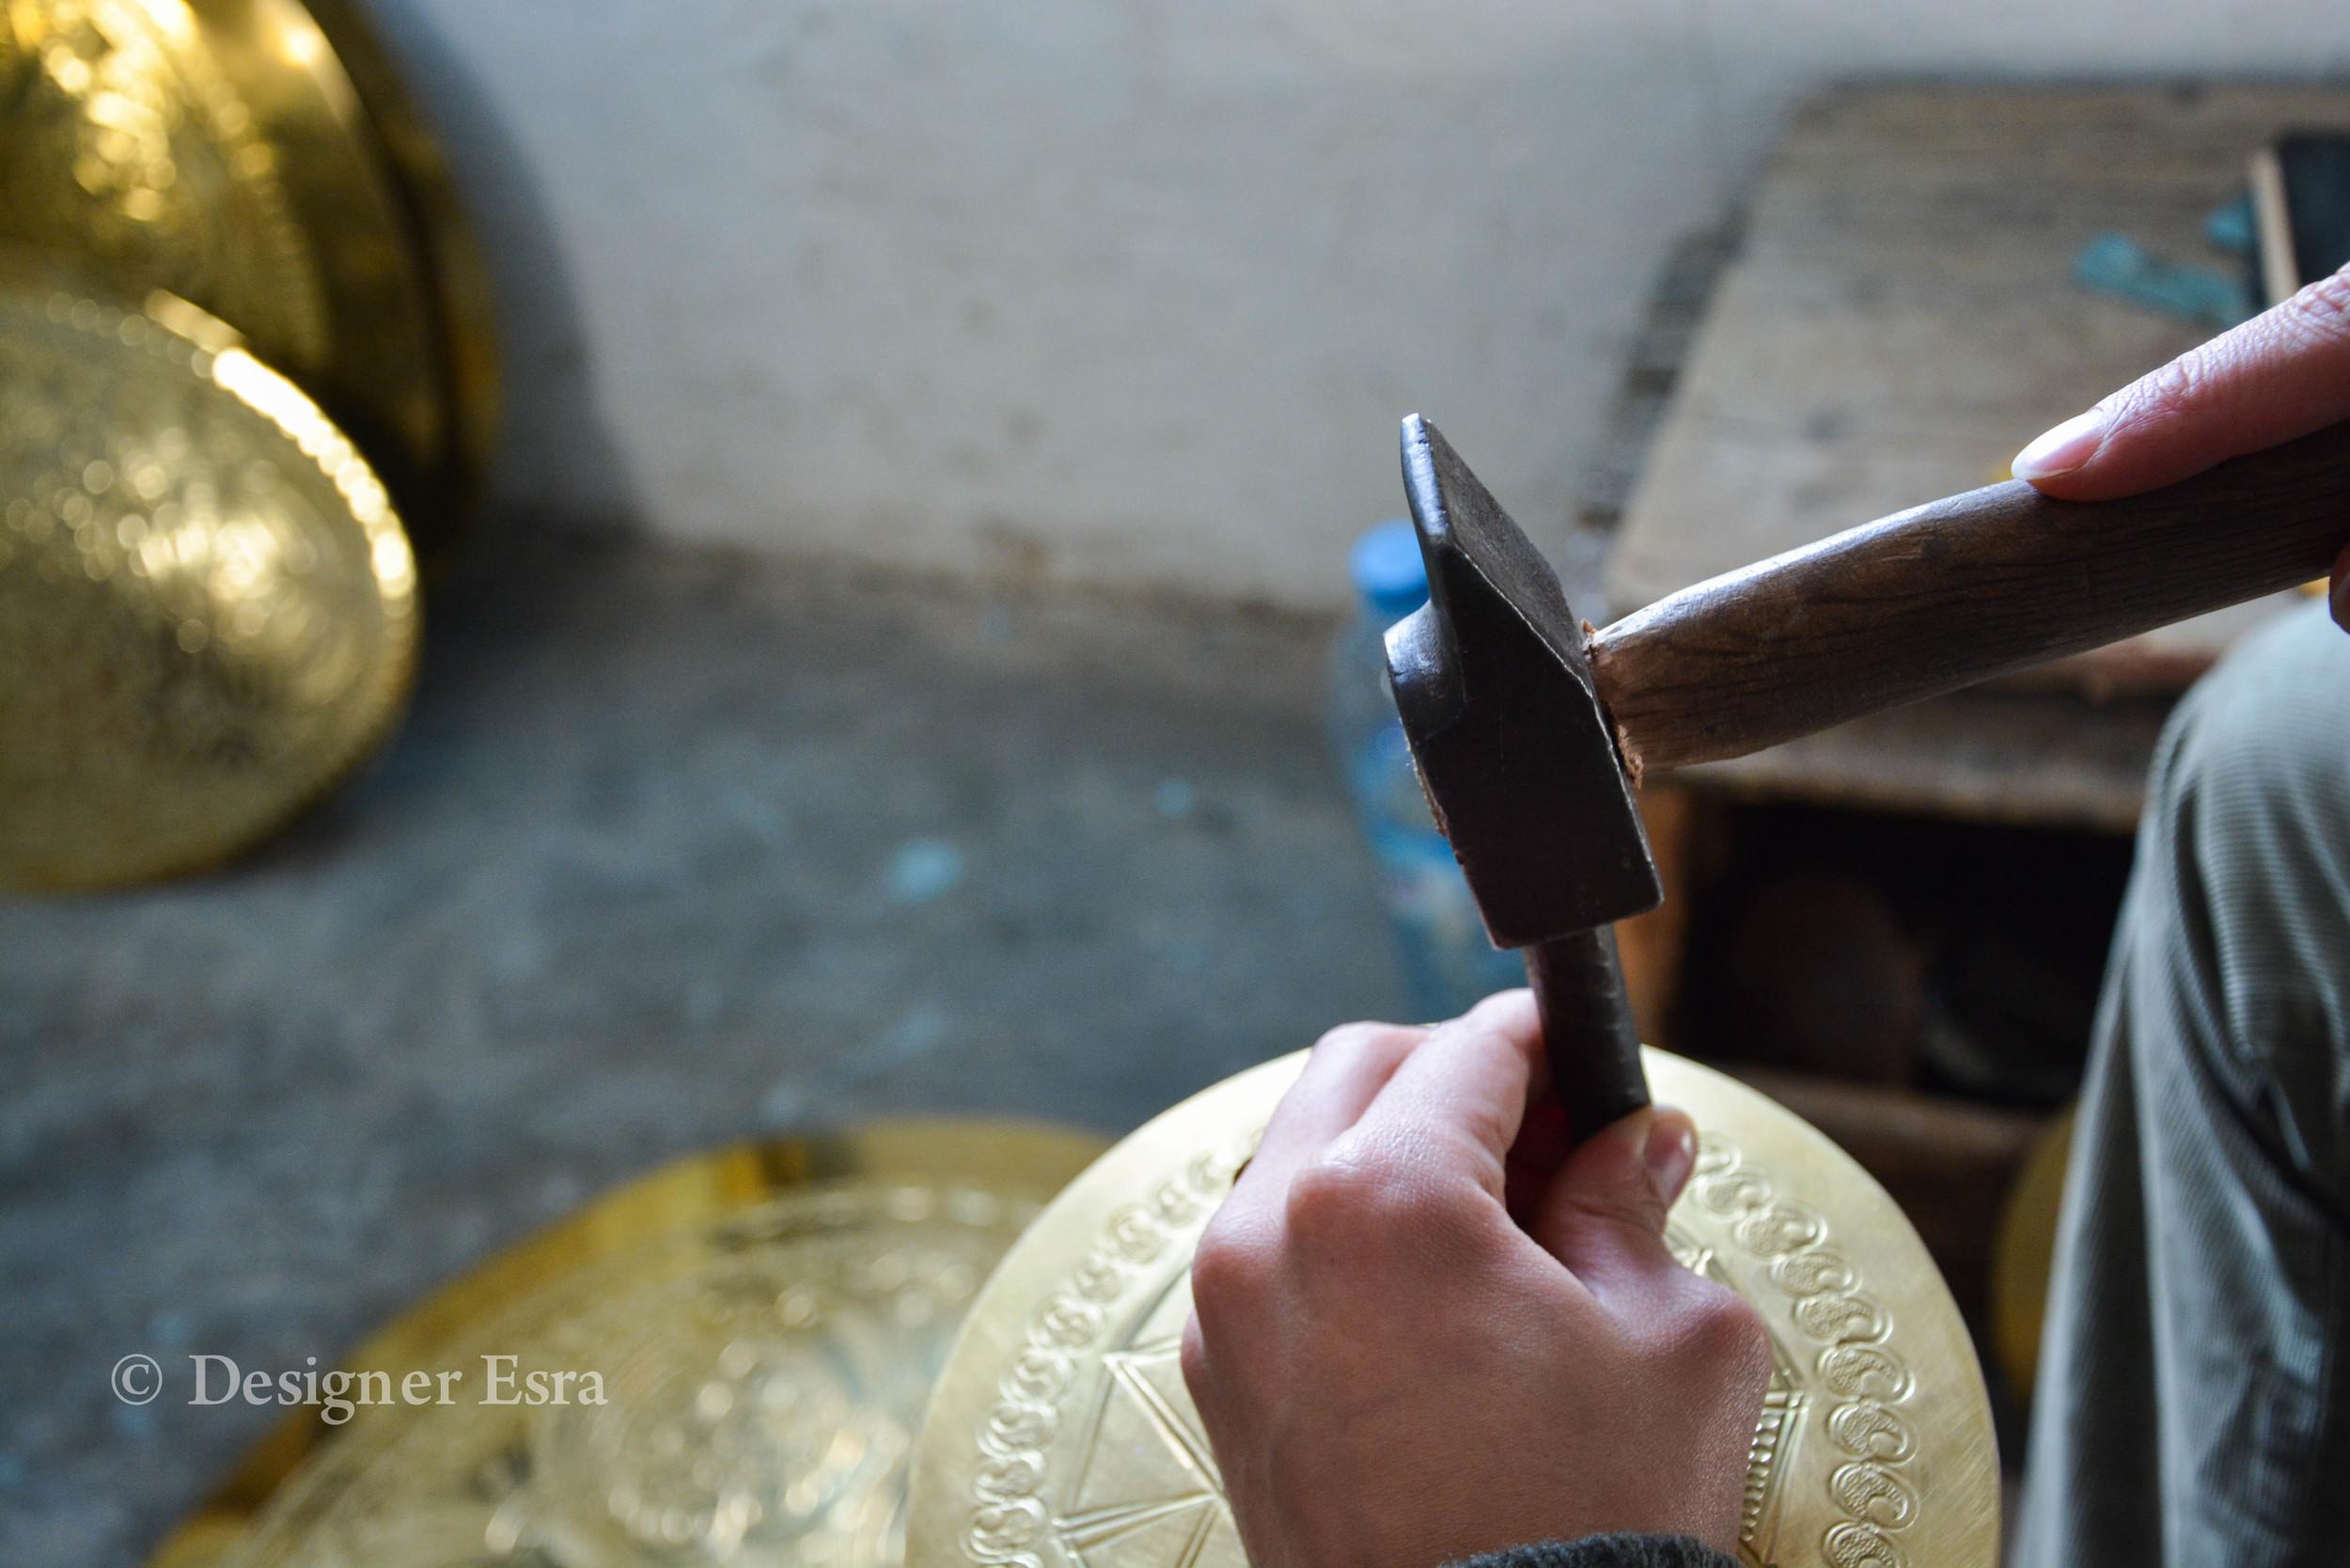 Hamza El Fasiki working on brass